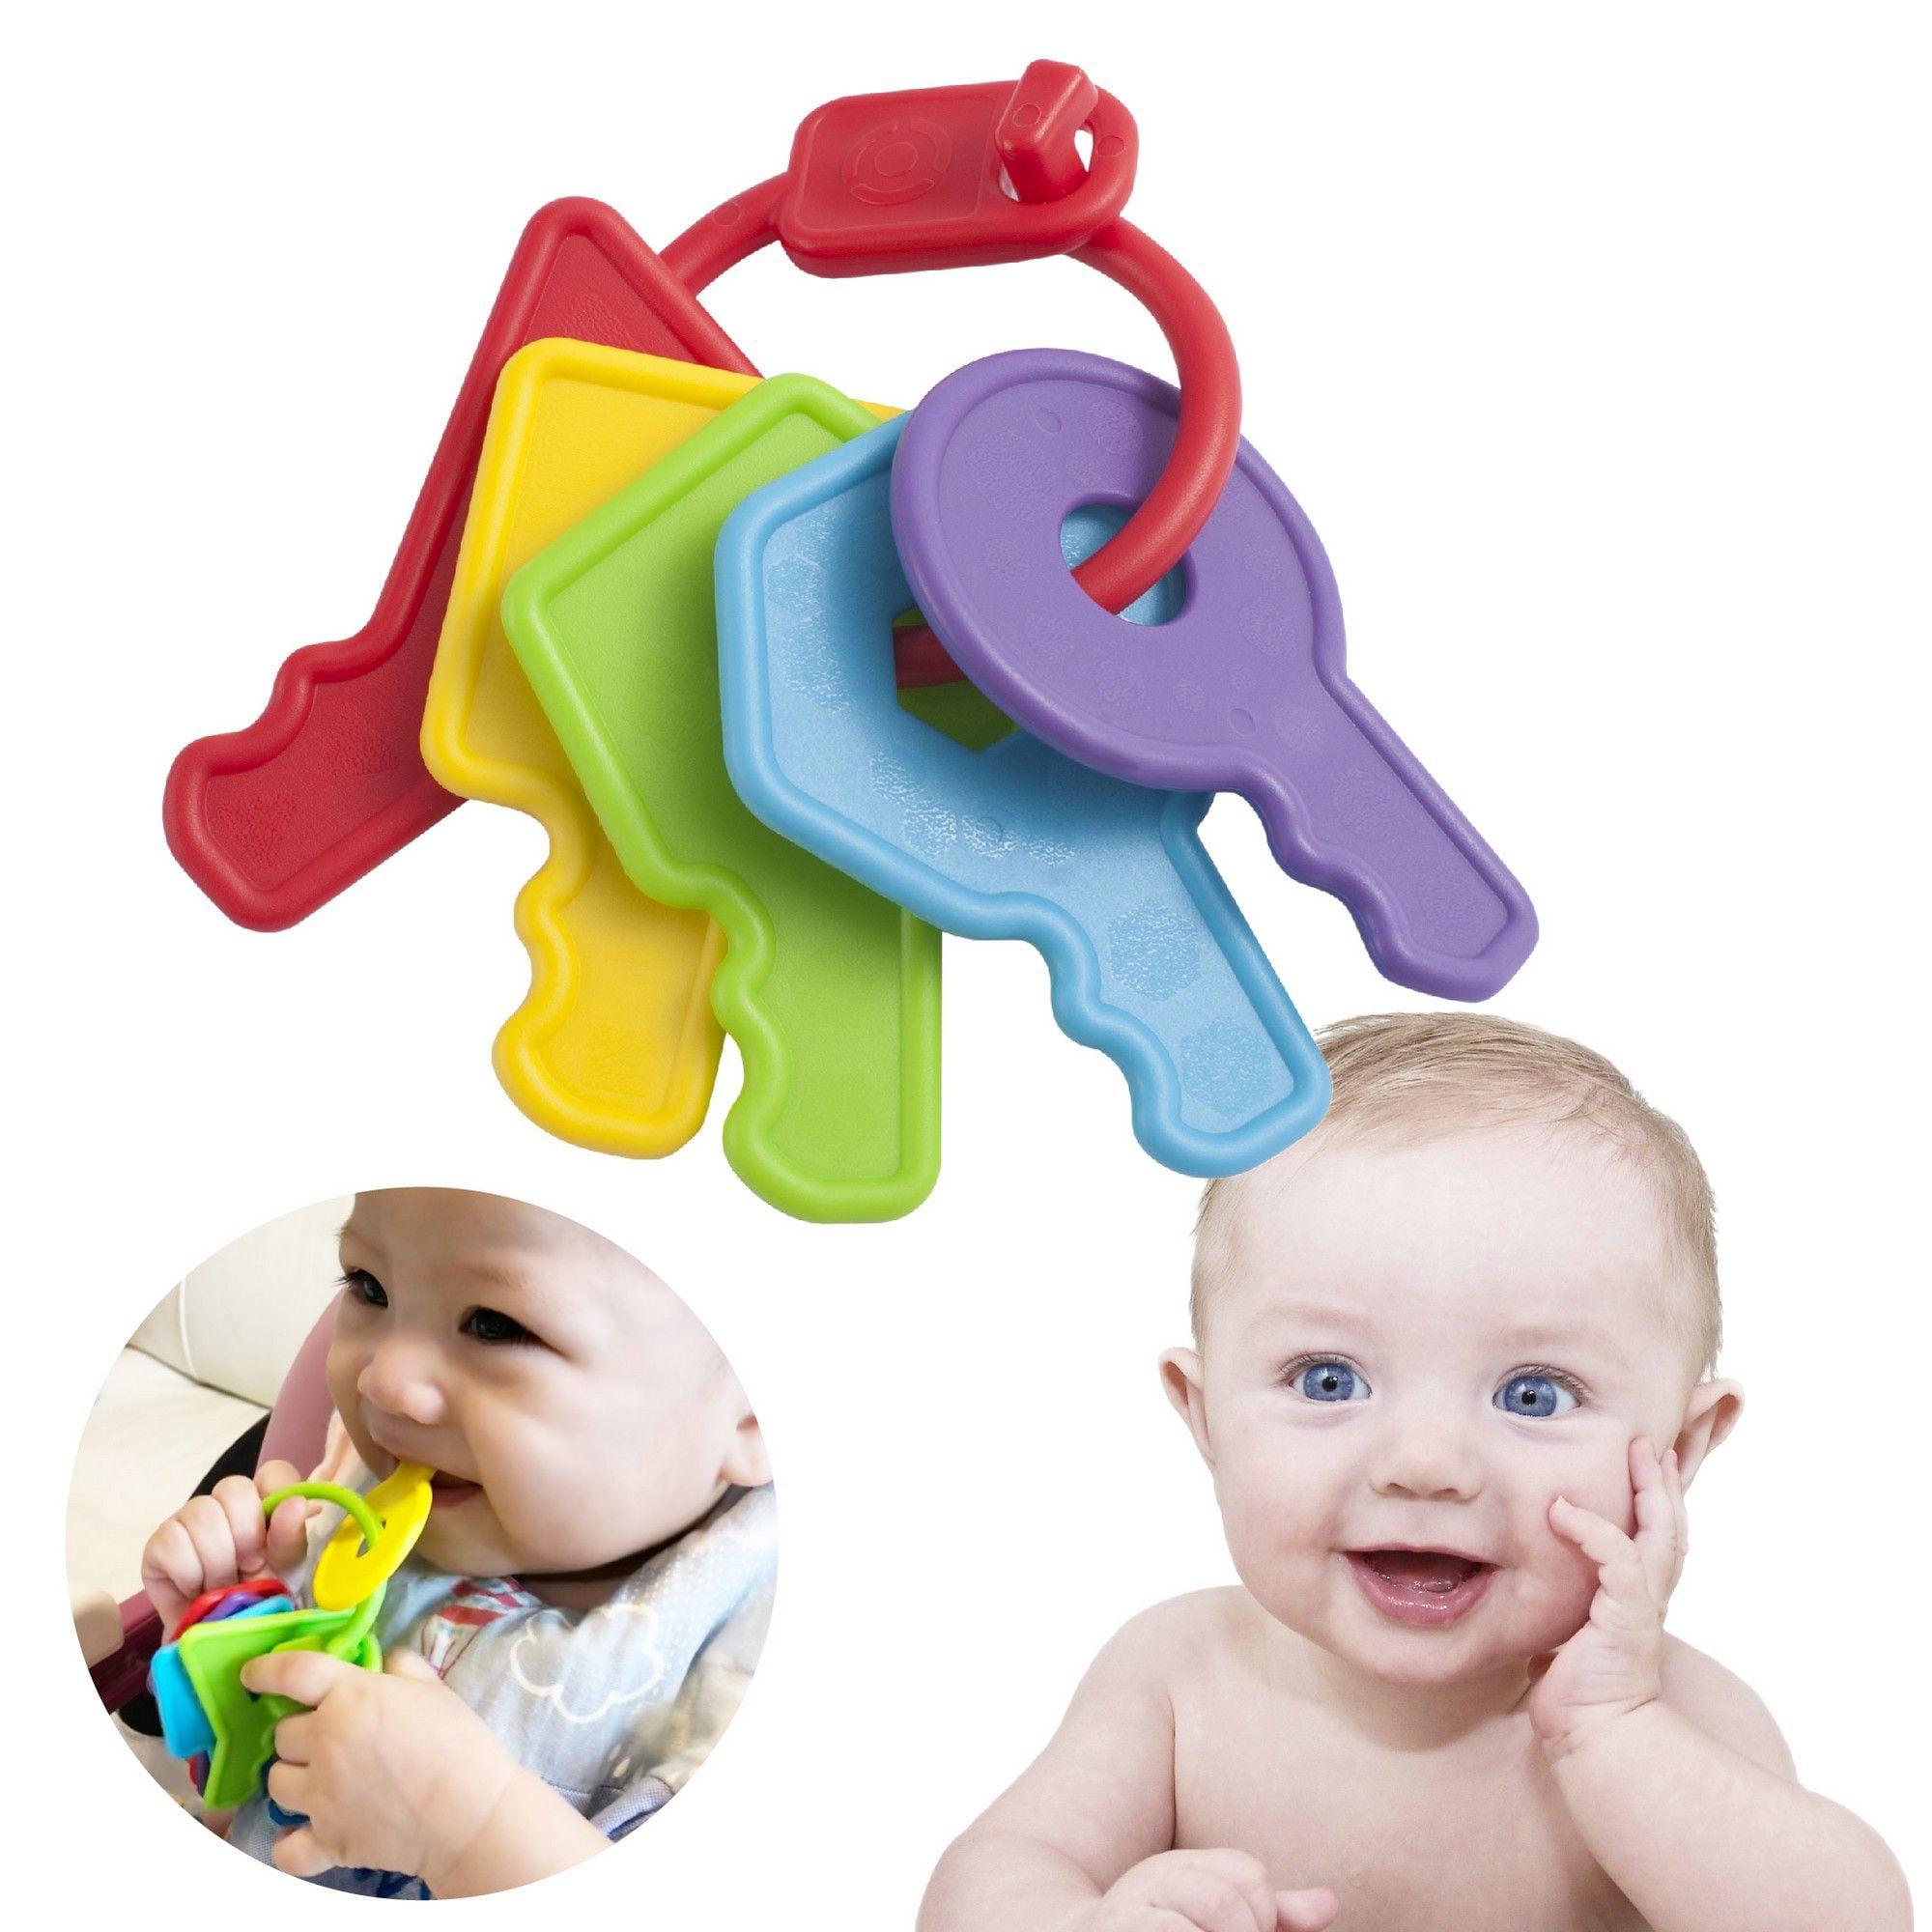 INNOKA Baby Teething Toys Key Teether Ring Gift for Baby ...